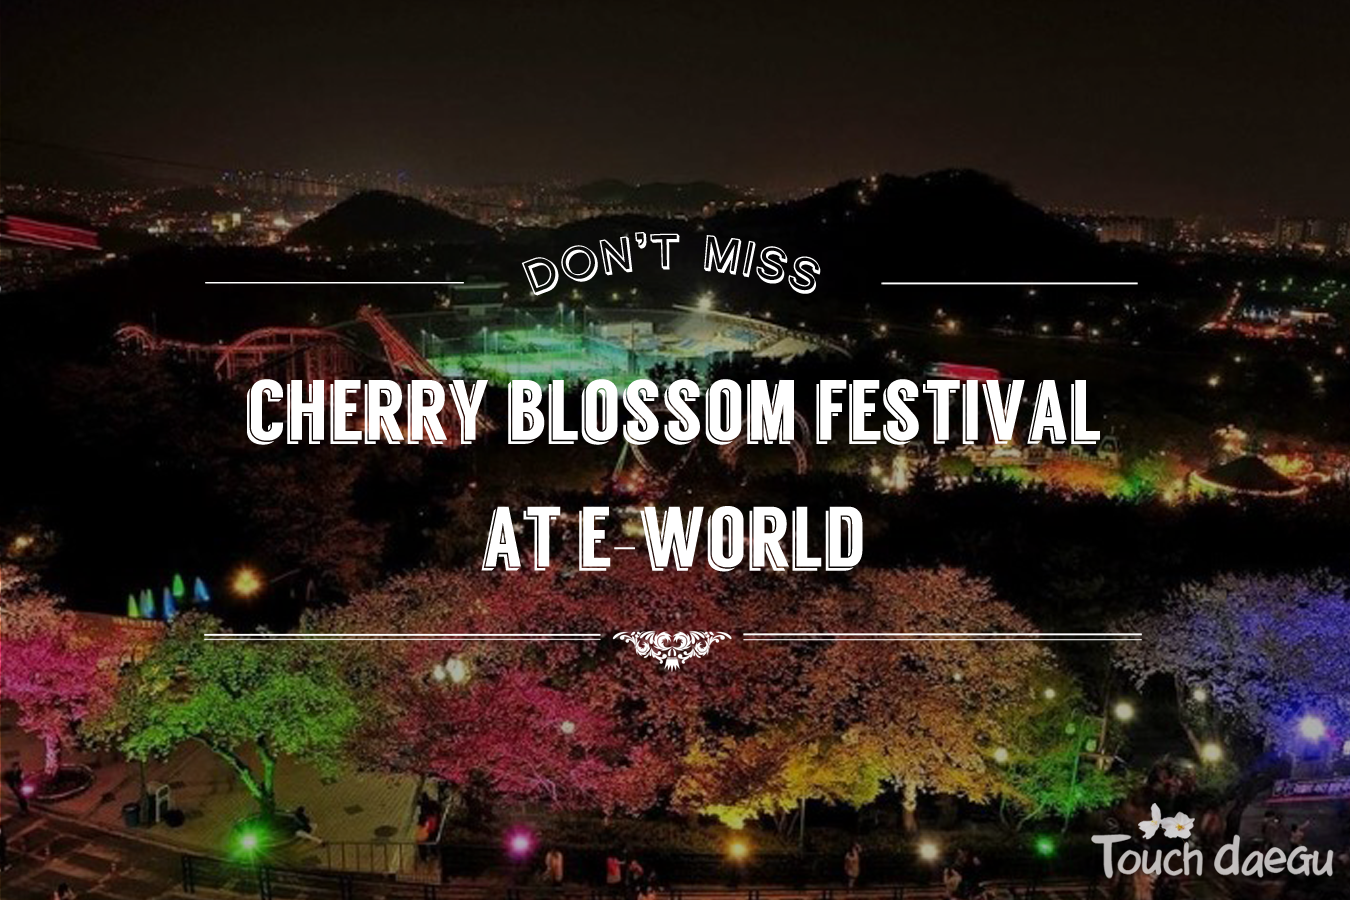 Daegu spring festival